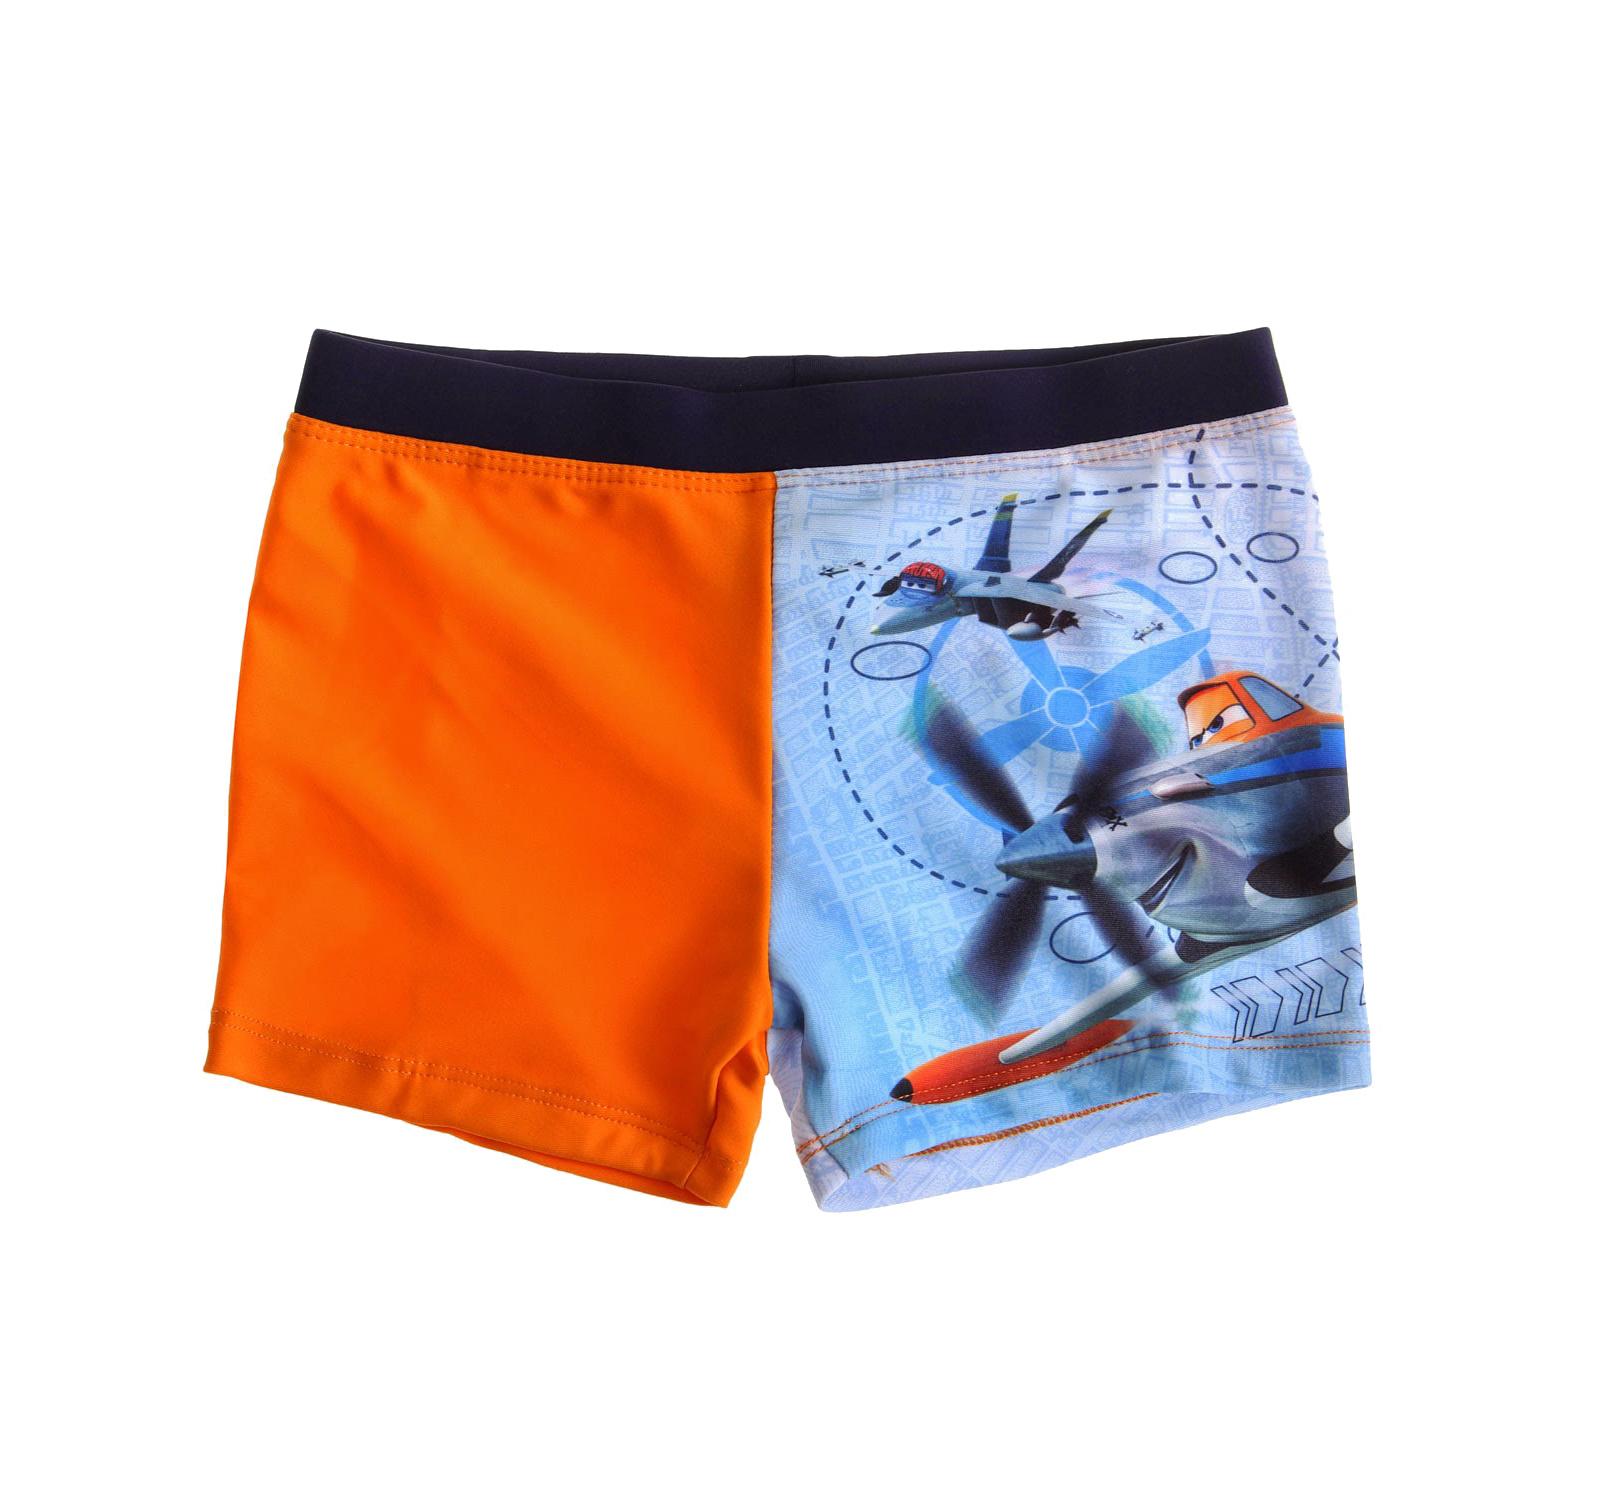 Planes® Boxer baie (98-128)  Oranj